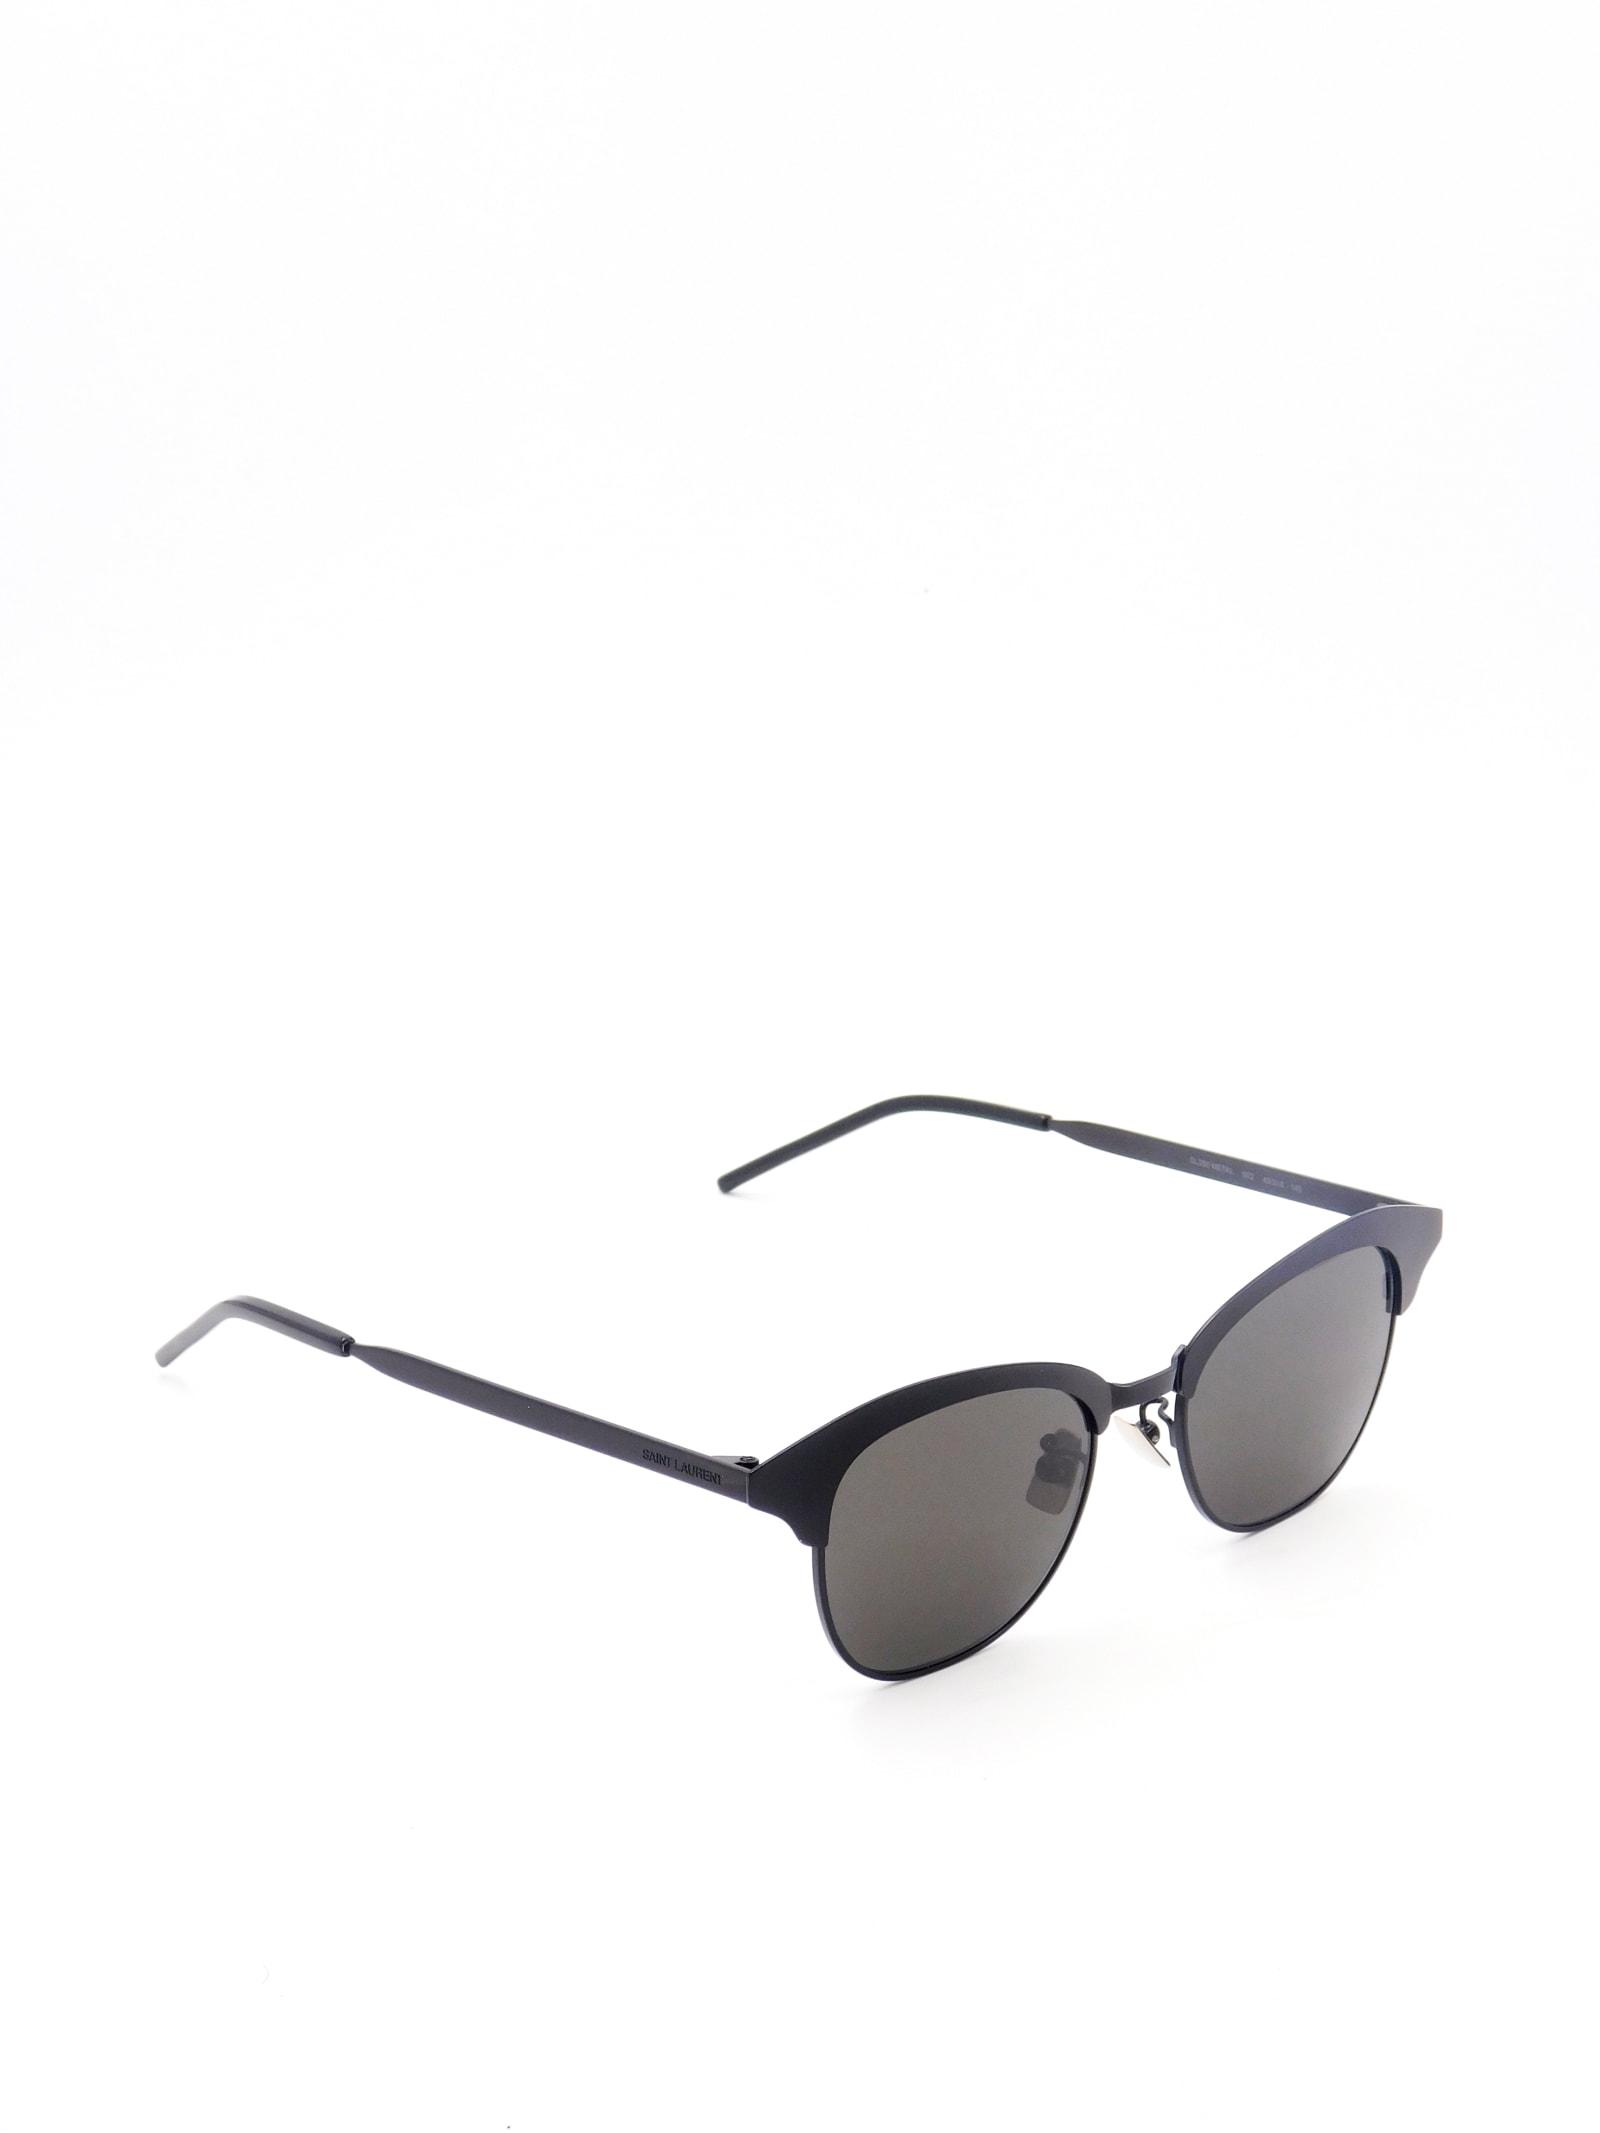 Saint Laurent SL 356 METAL Sunglasses